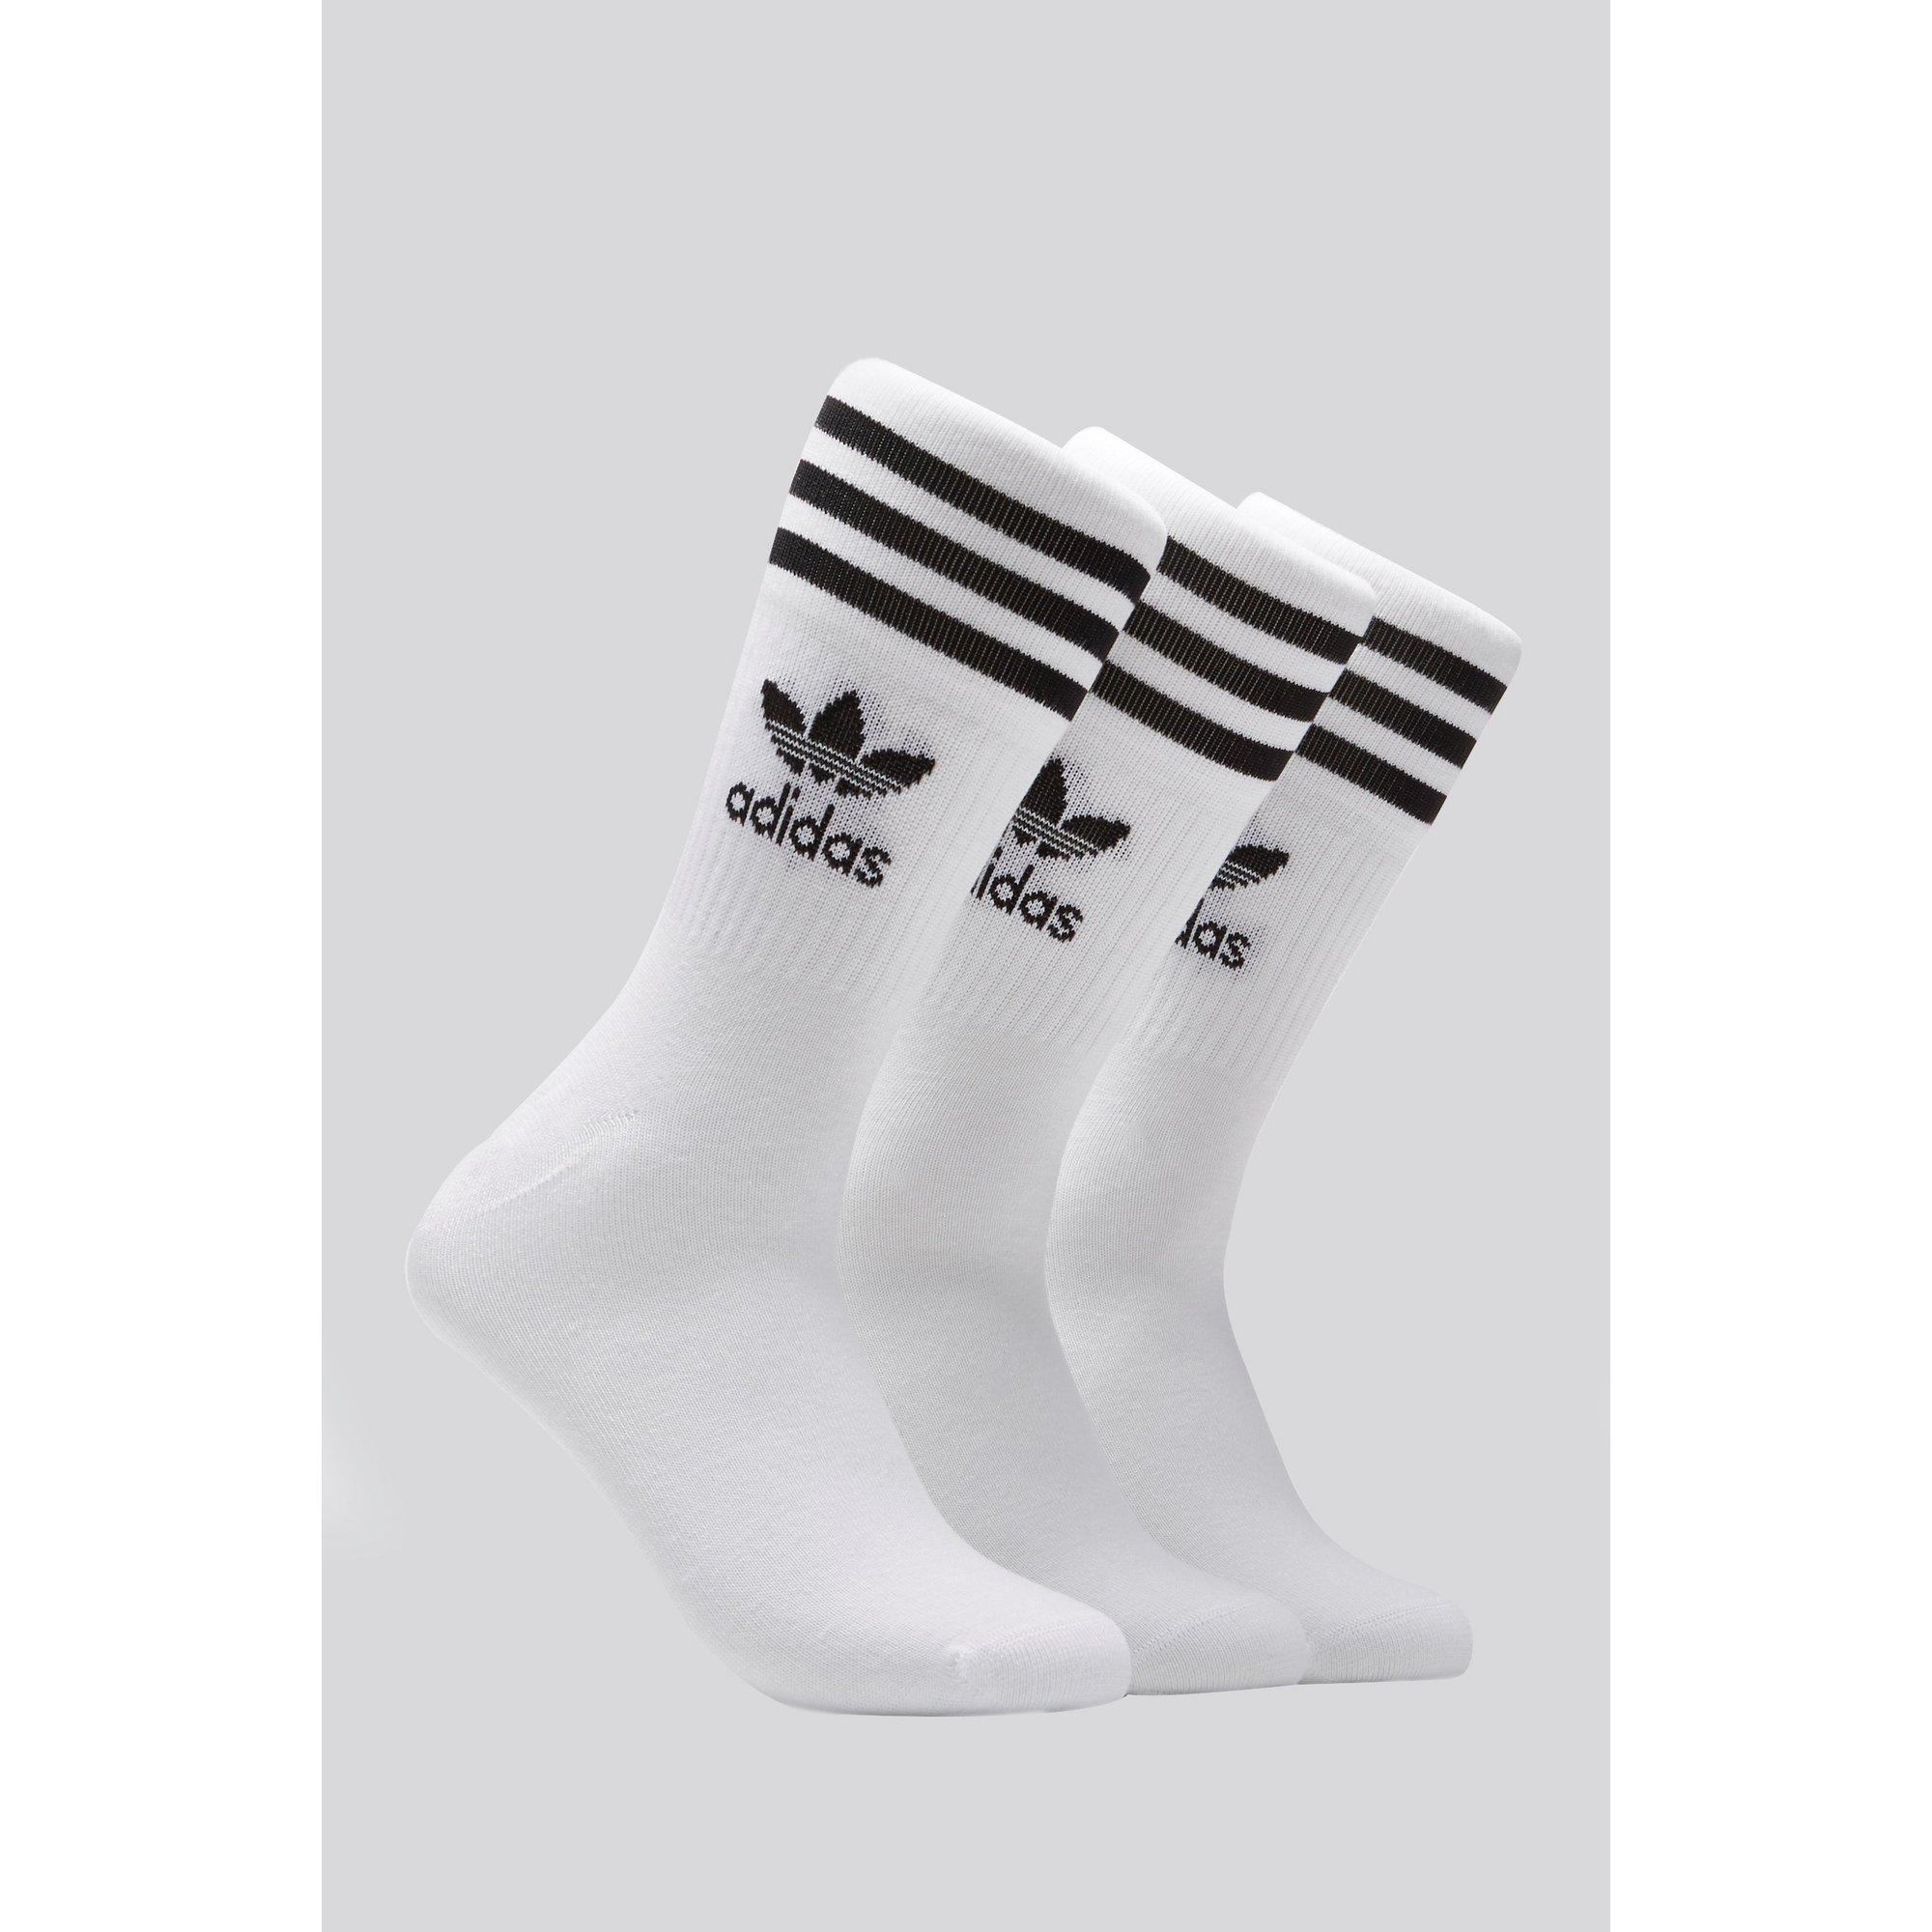 Image of adidas Originals Pack of 3 Mid Crew Socks